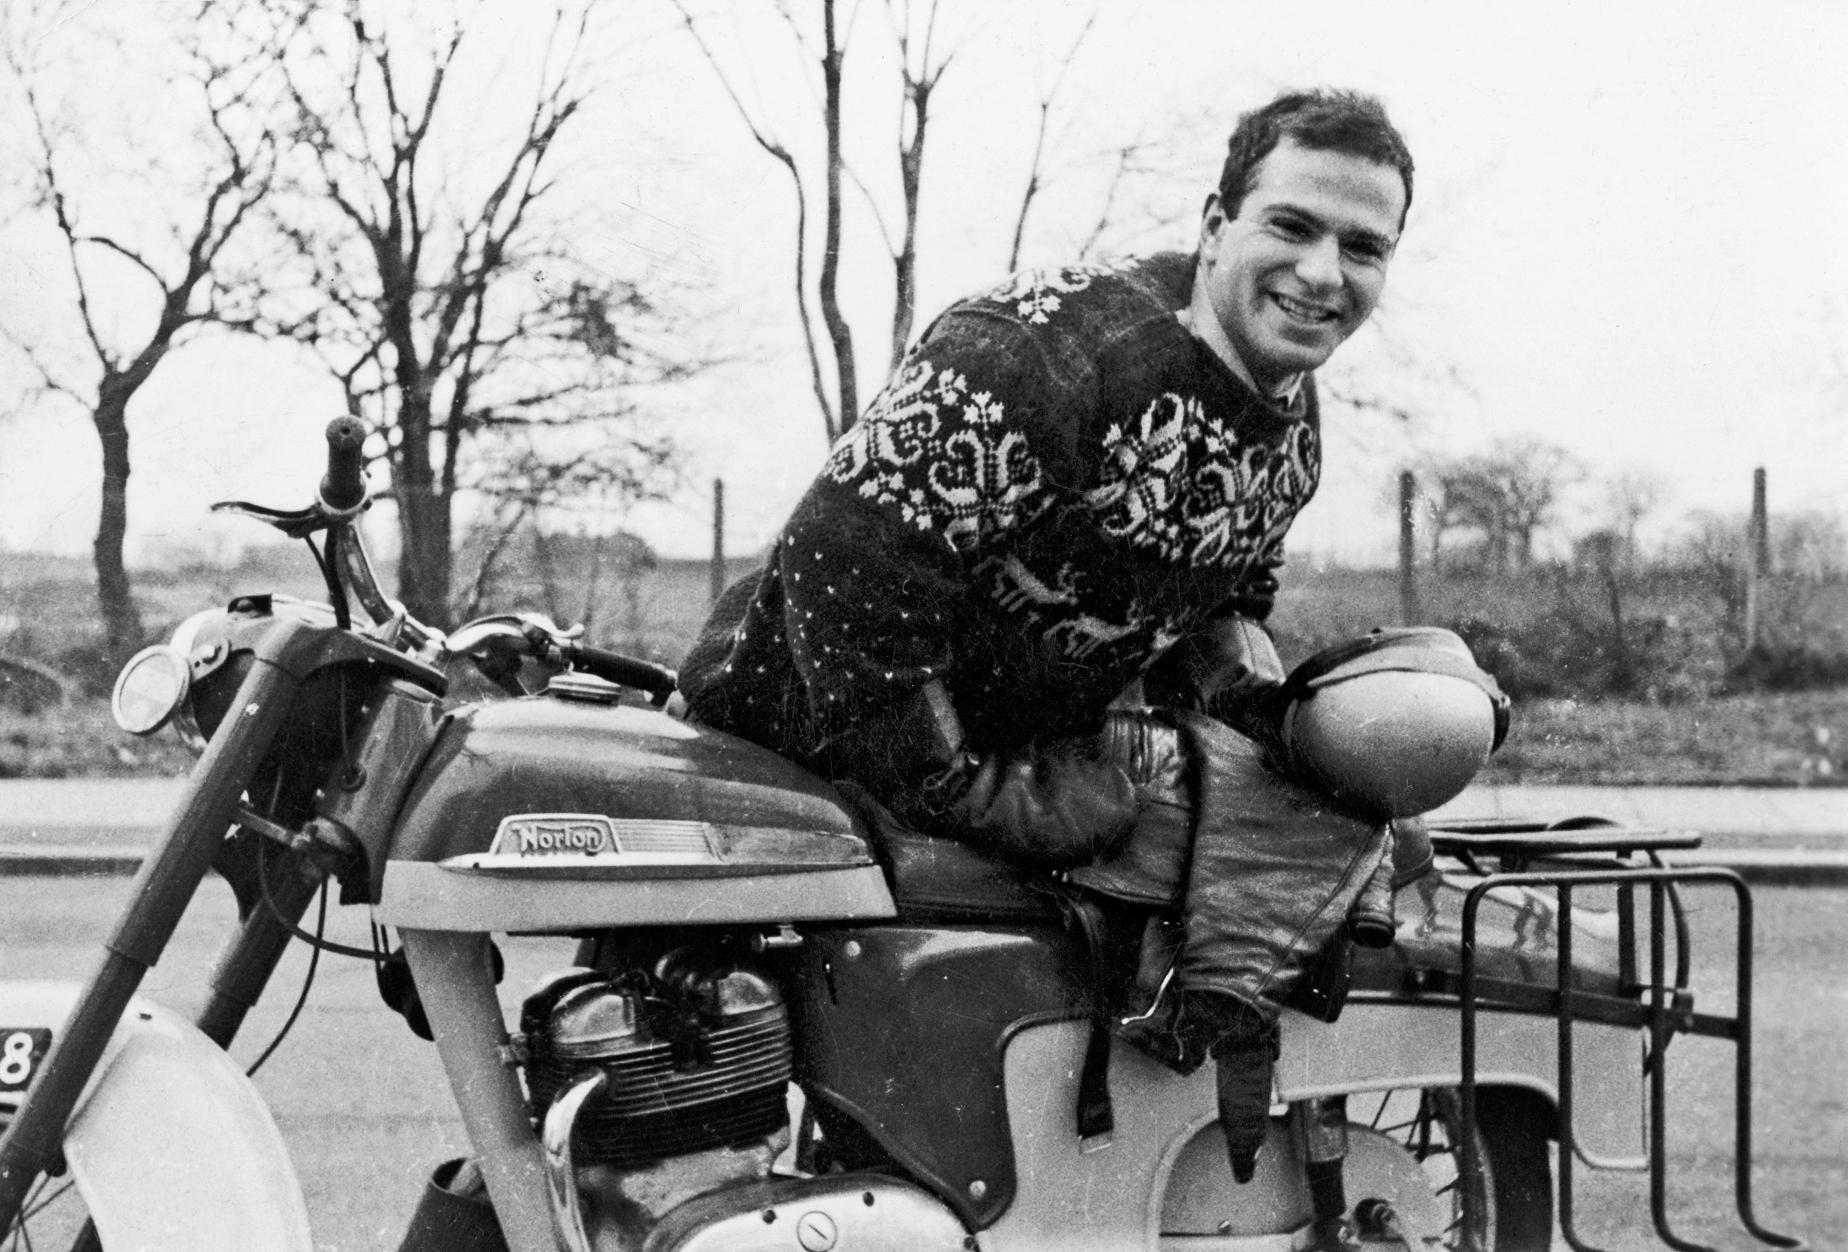 Oliver Sacks Motorcycle